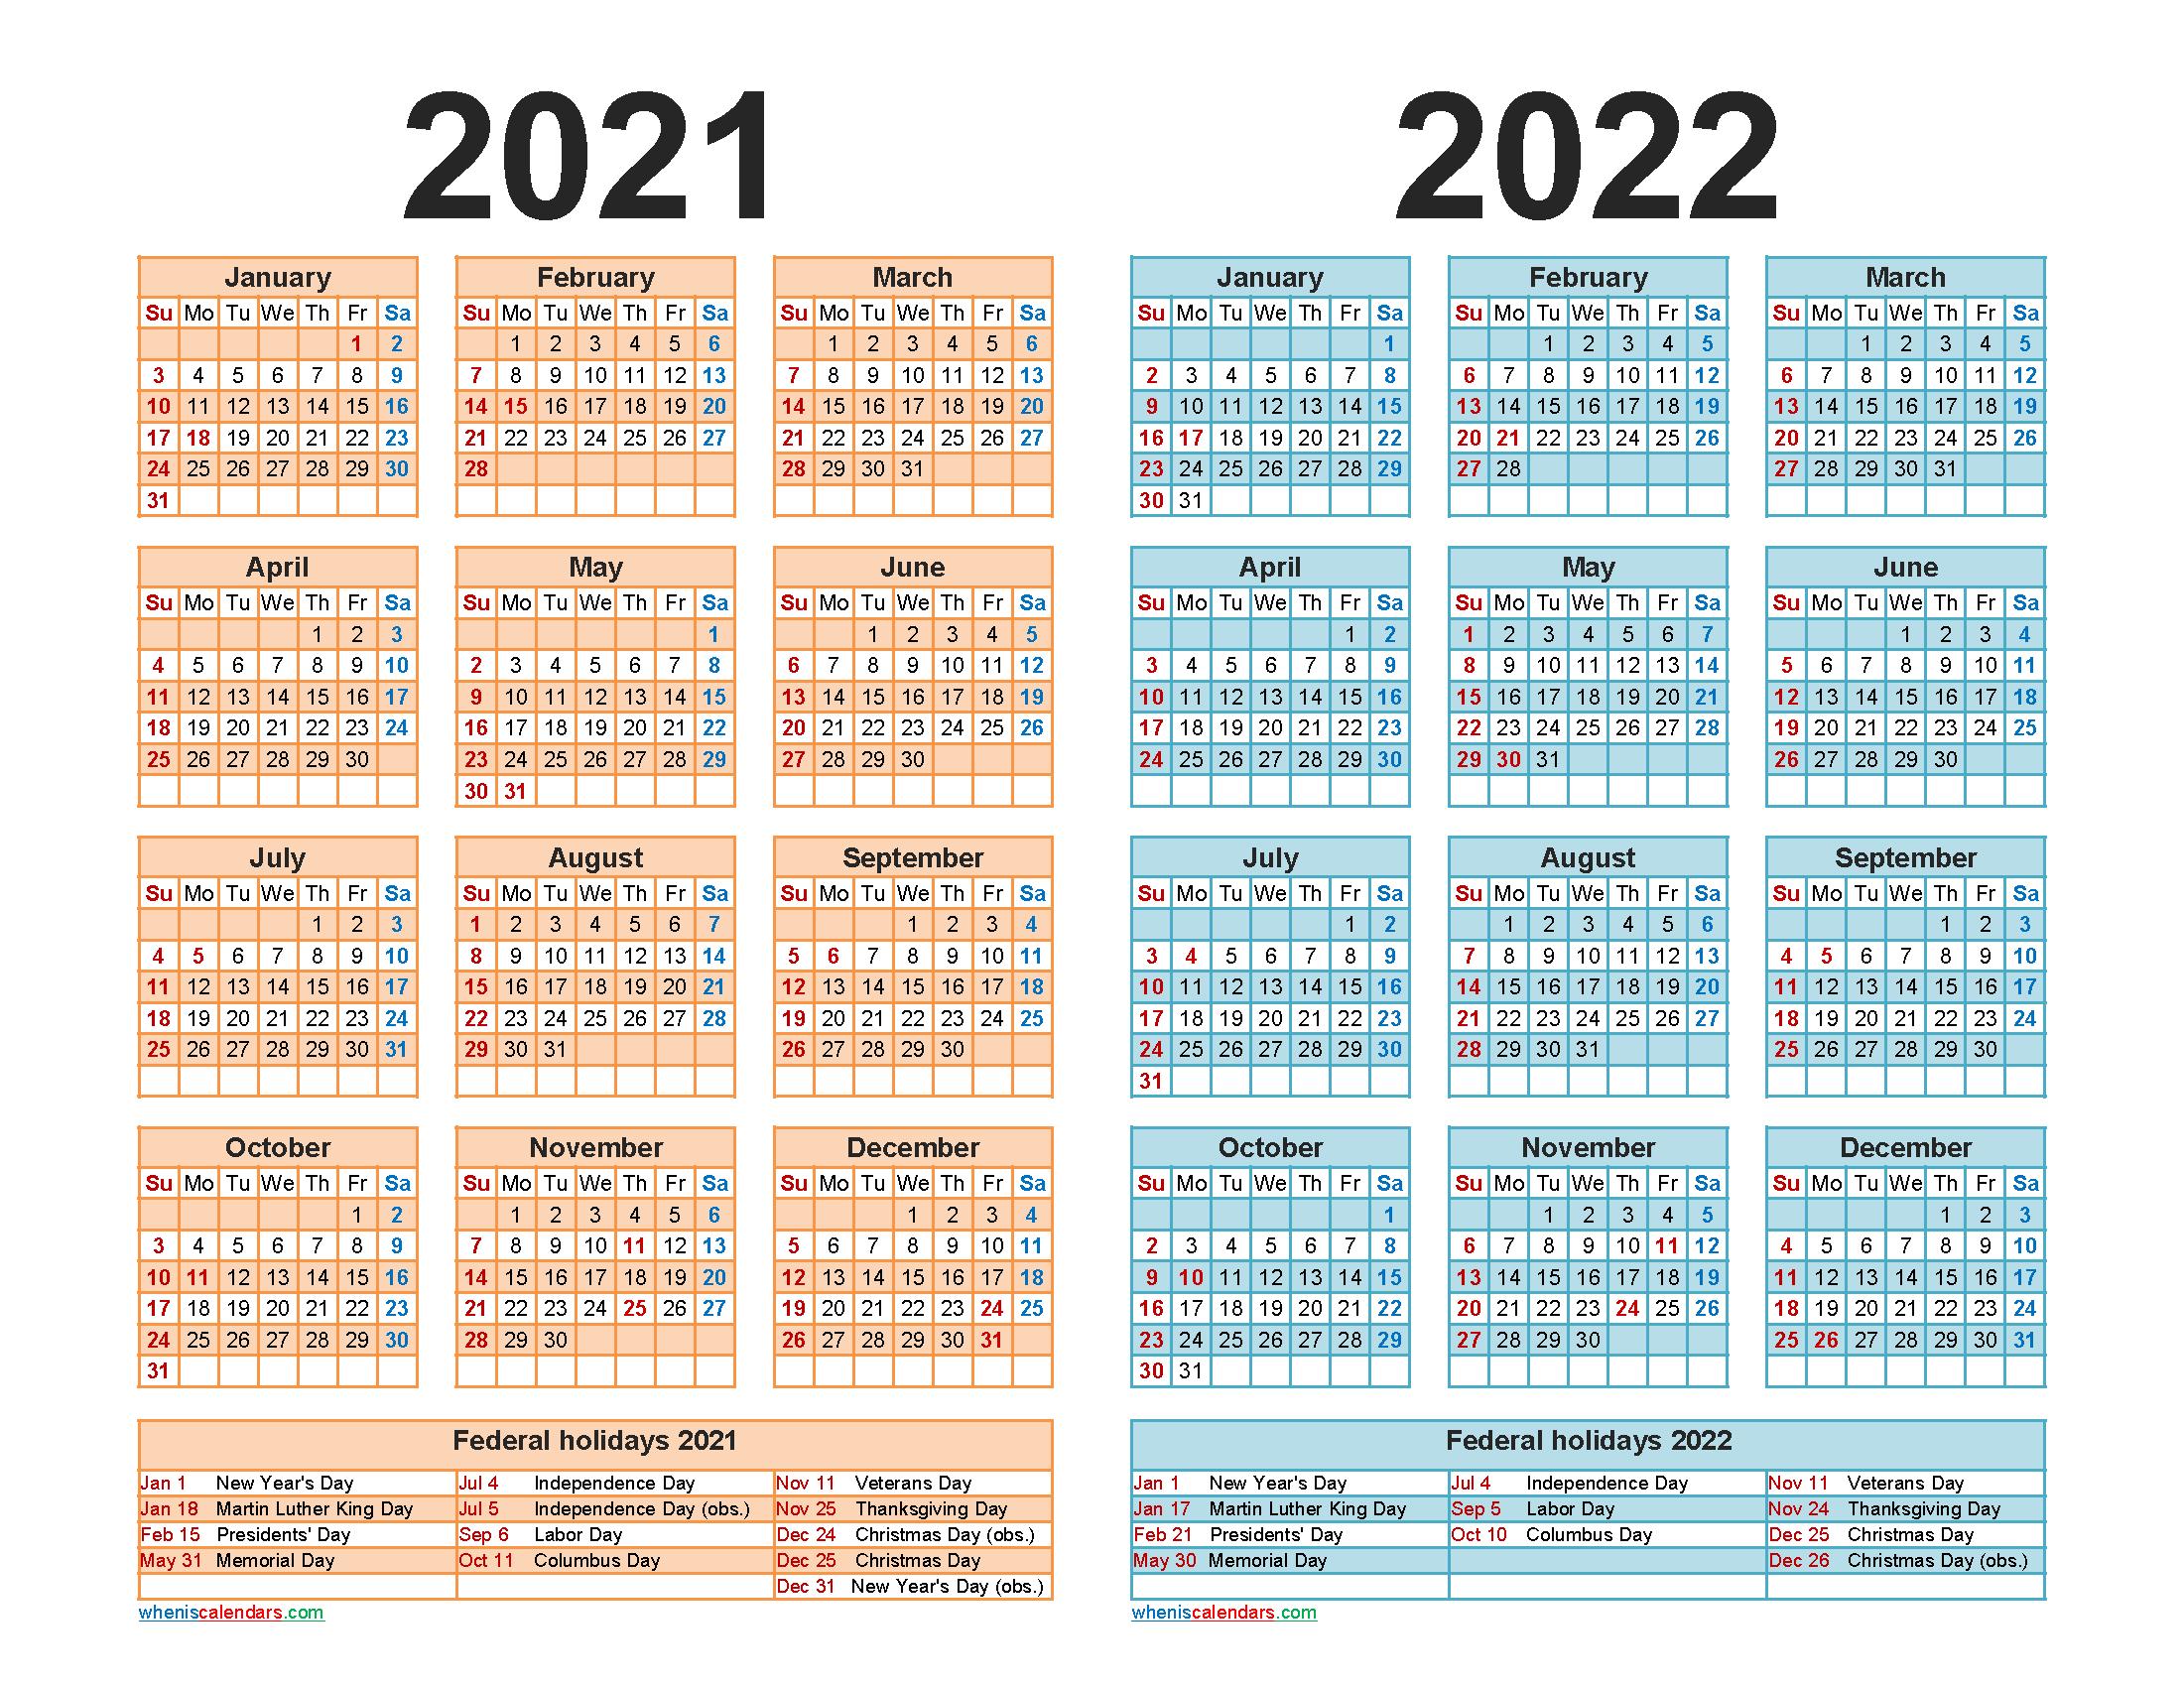 Free 2021 2022 Calendar Printable with Holidays